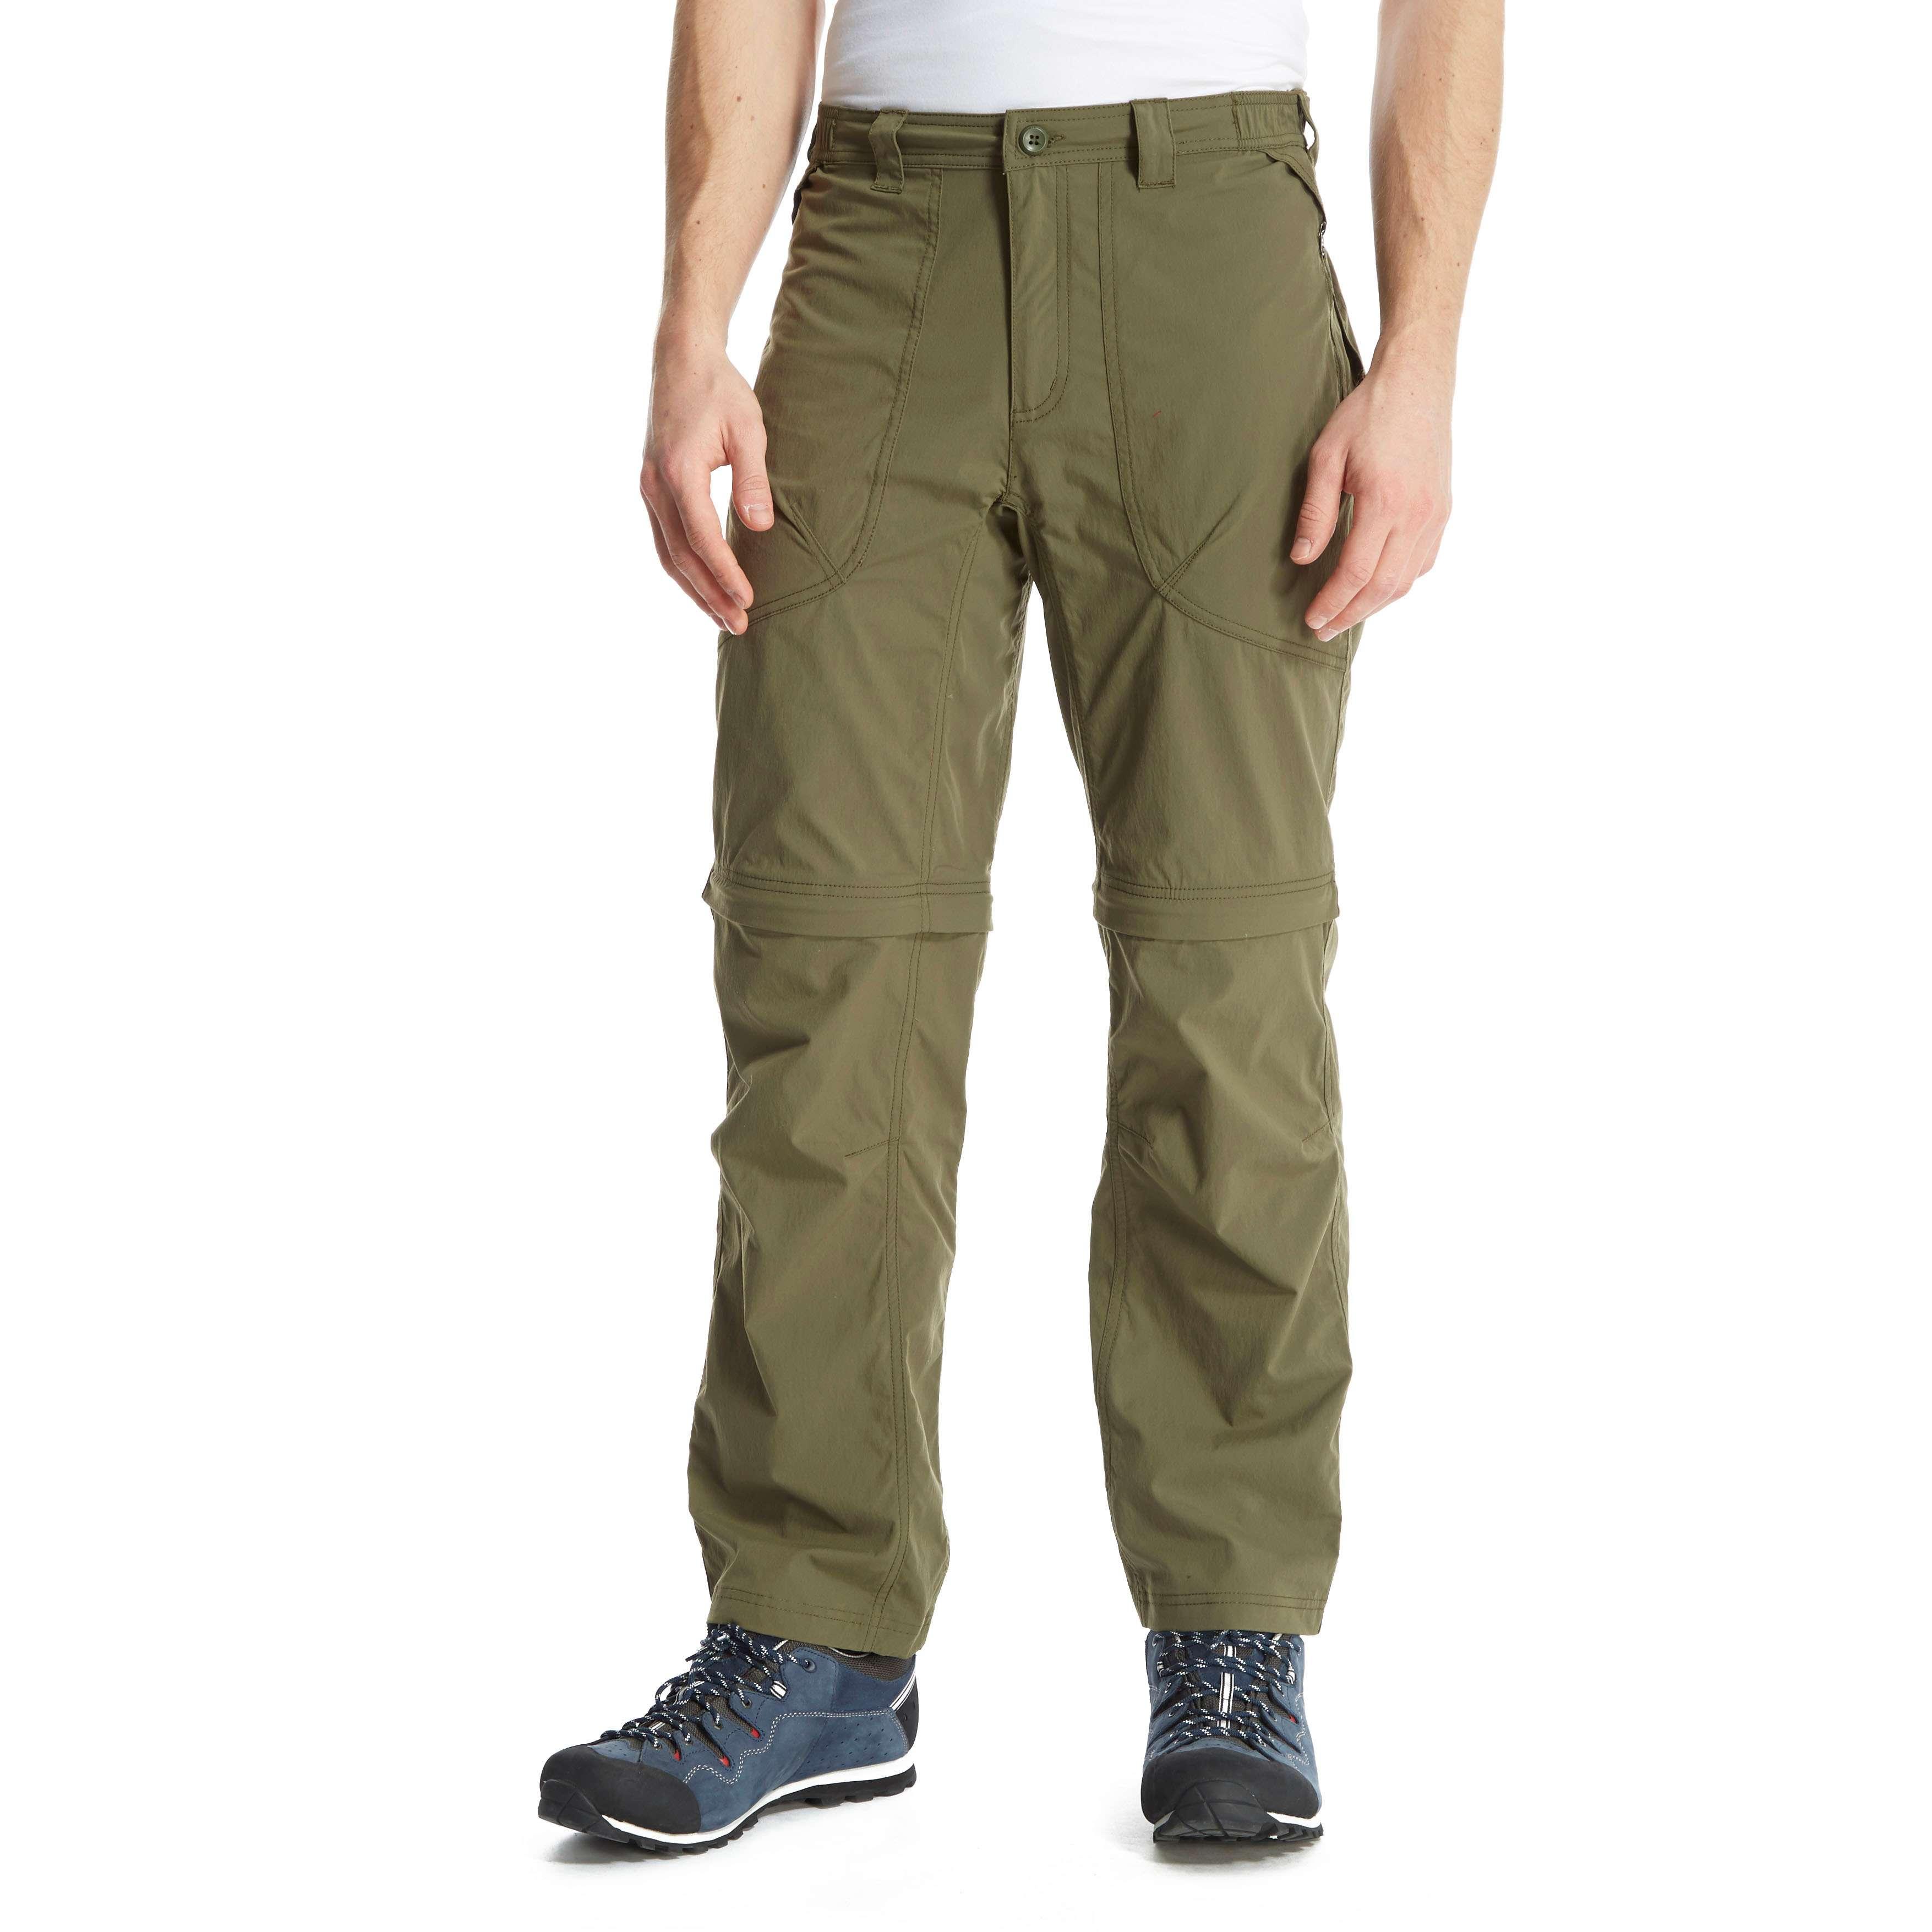 LOWE ALPINE Men's Java Convertible Pants